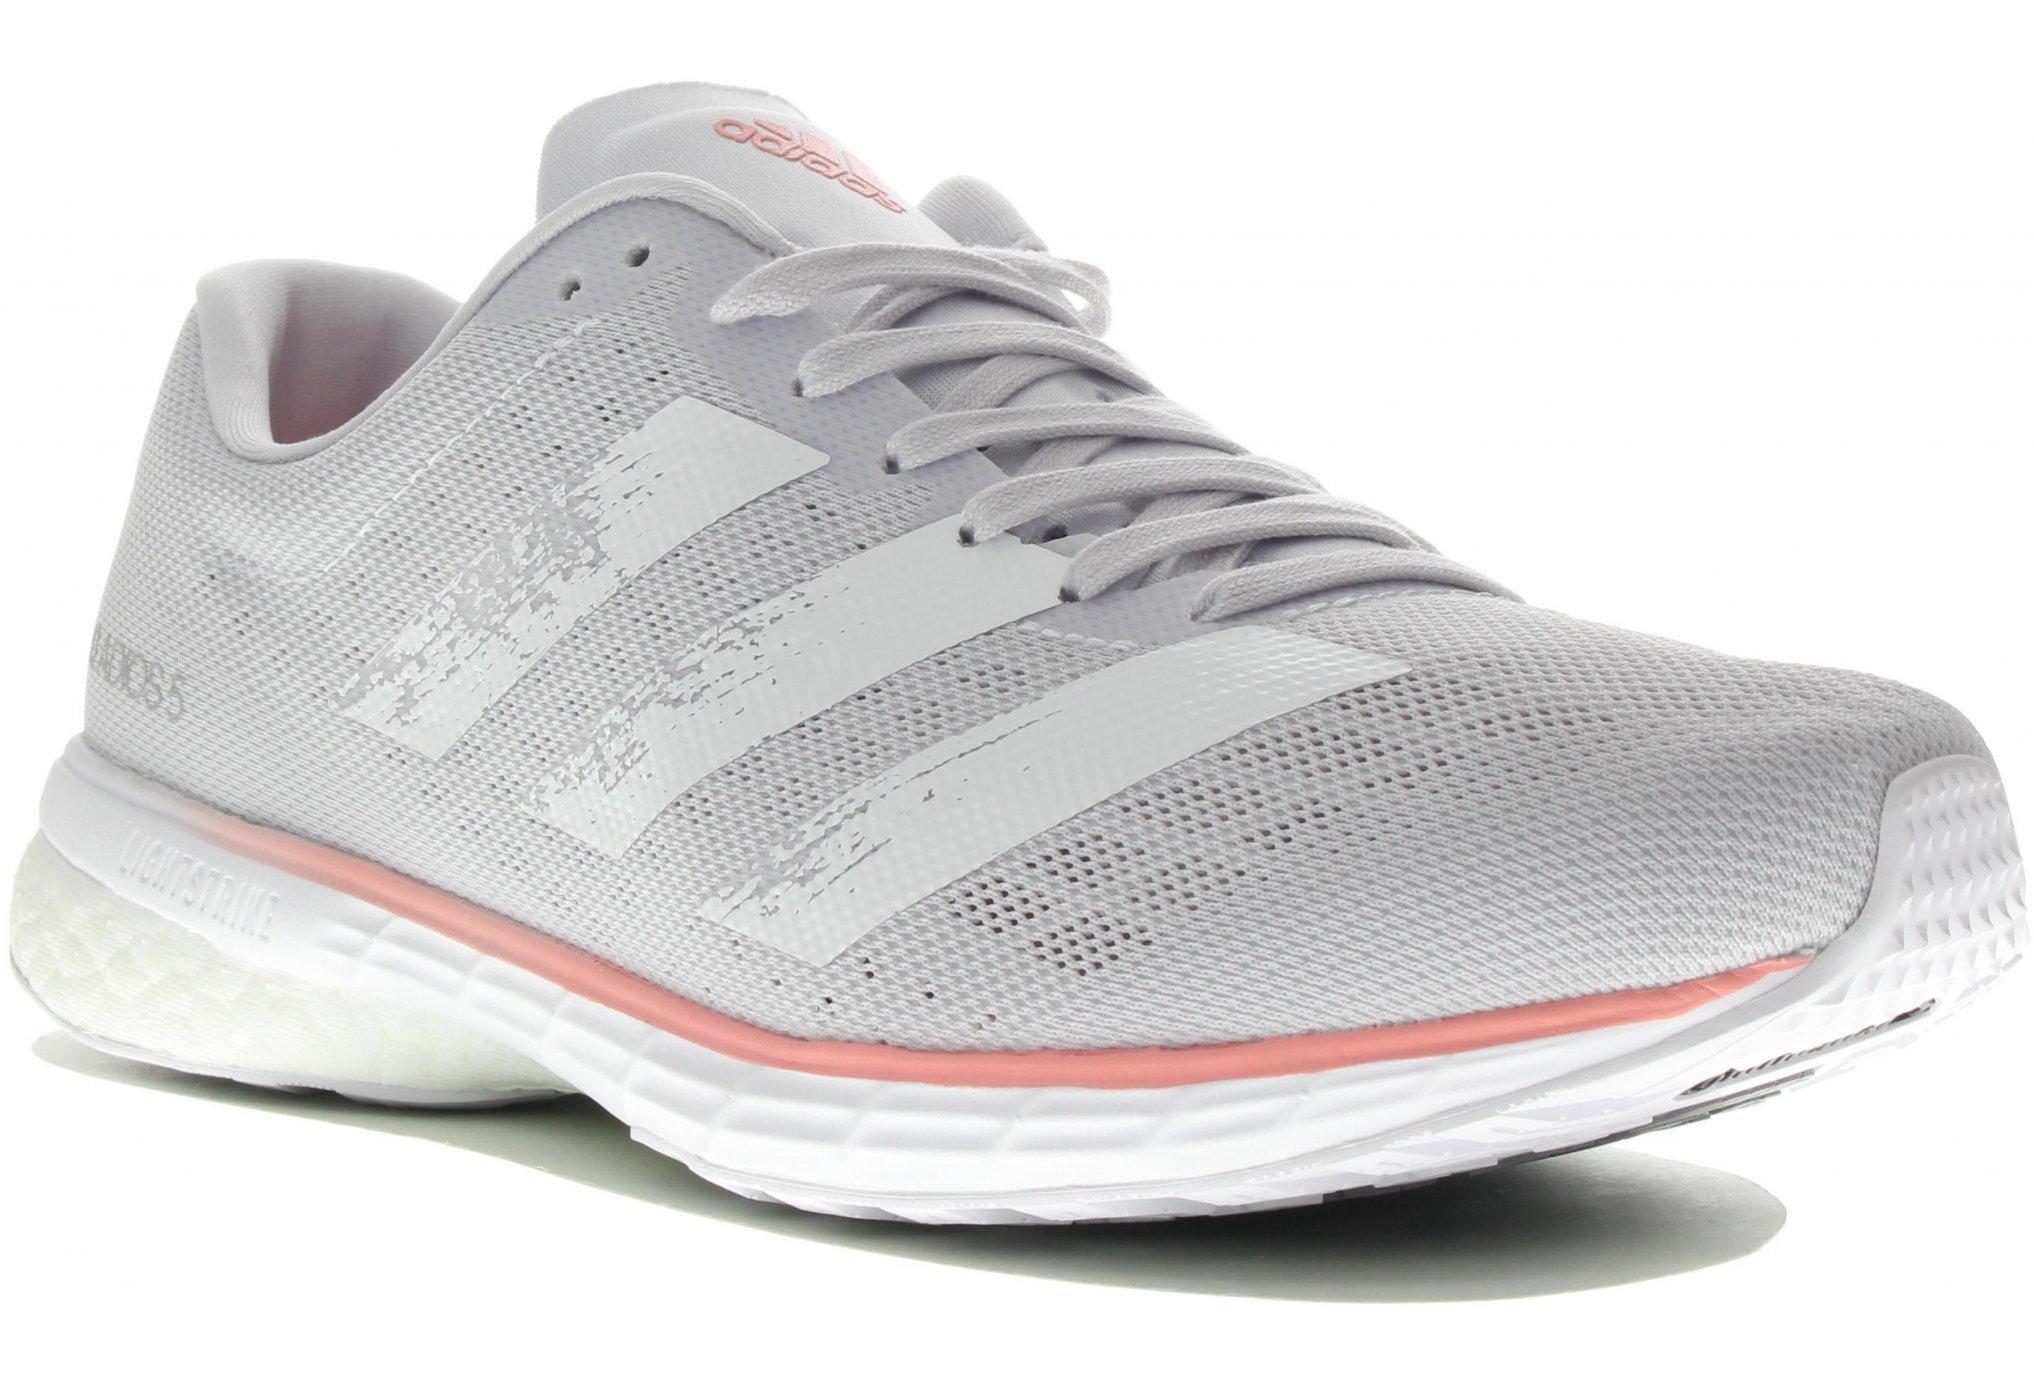 adidas adizero adios 5 W Chaussures running femme